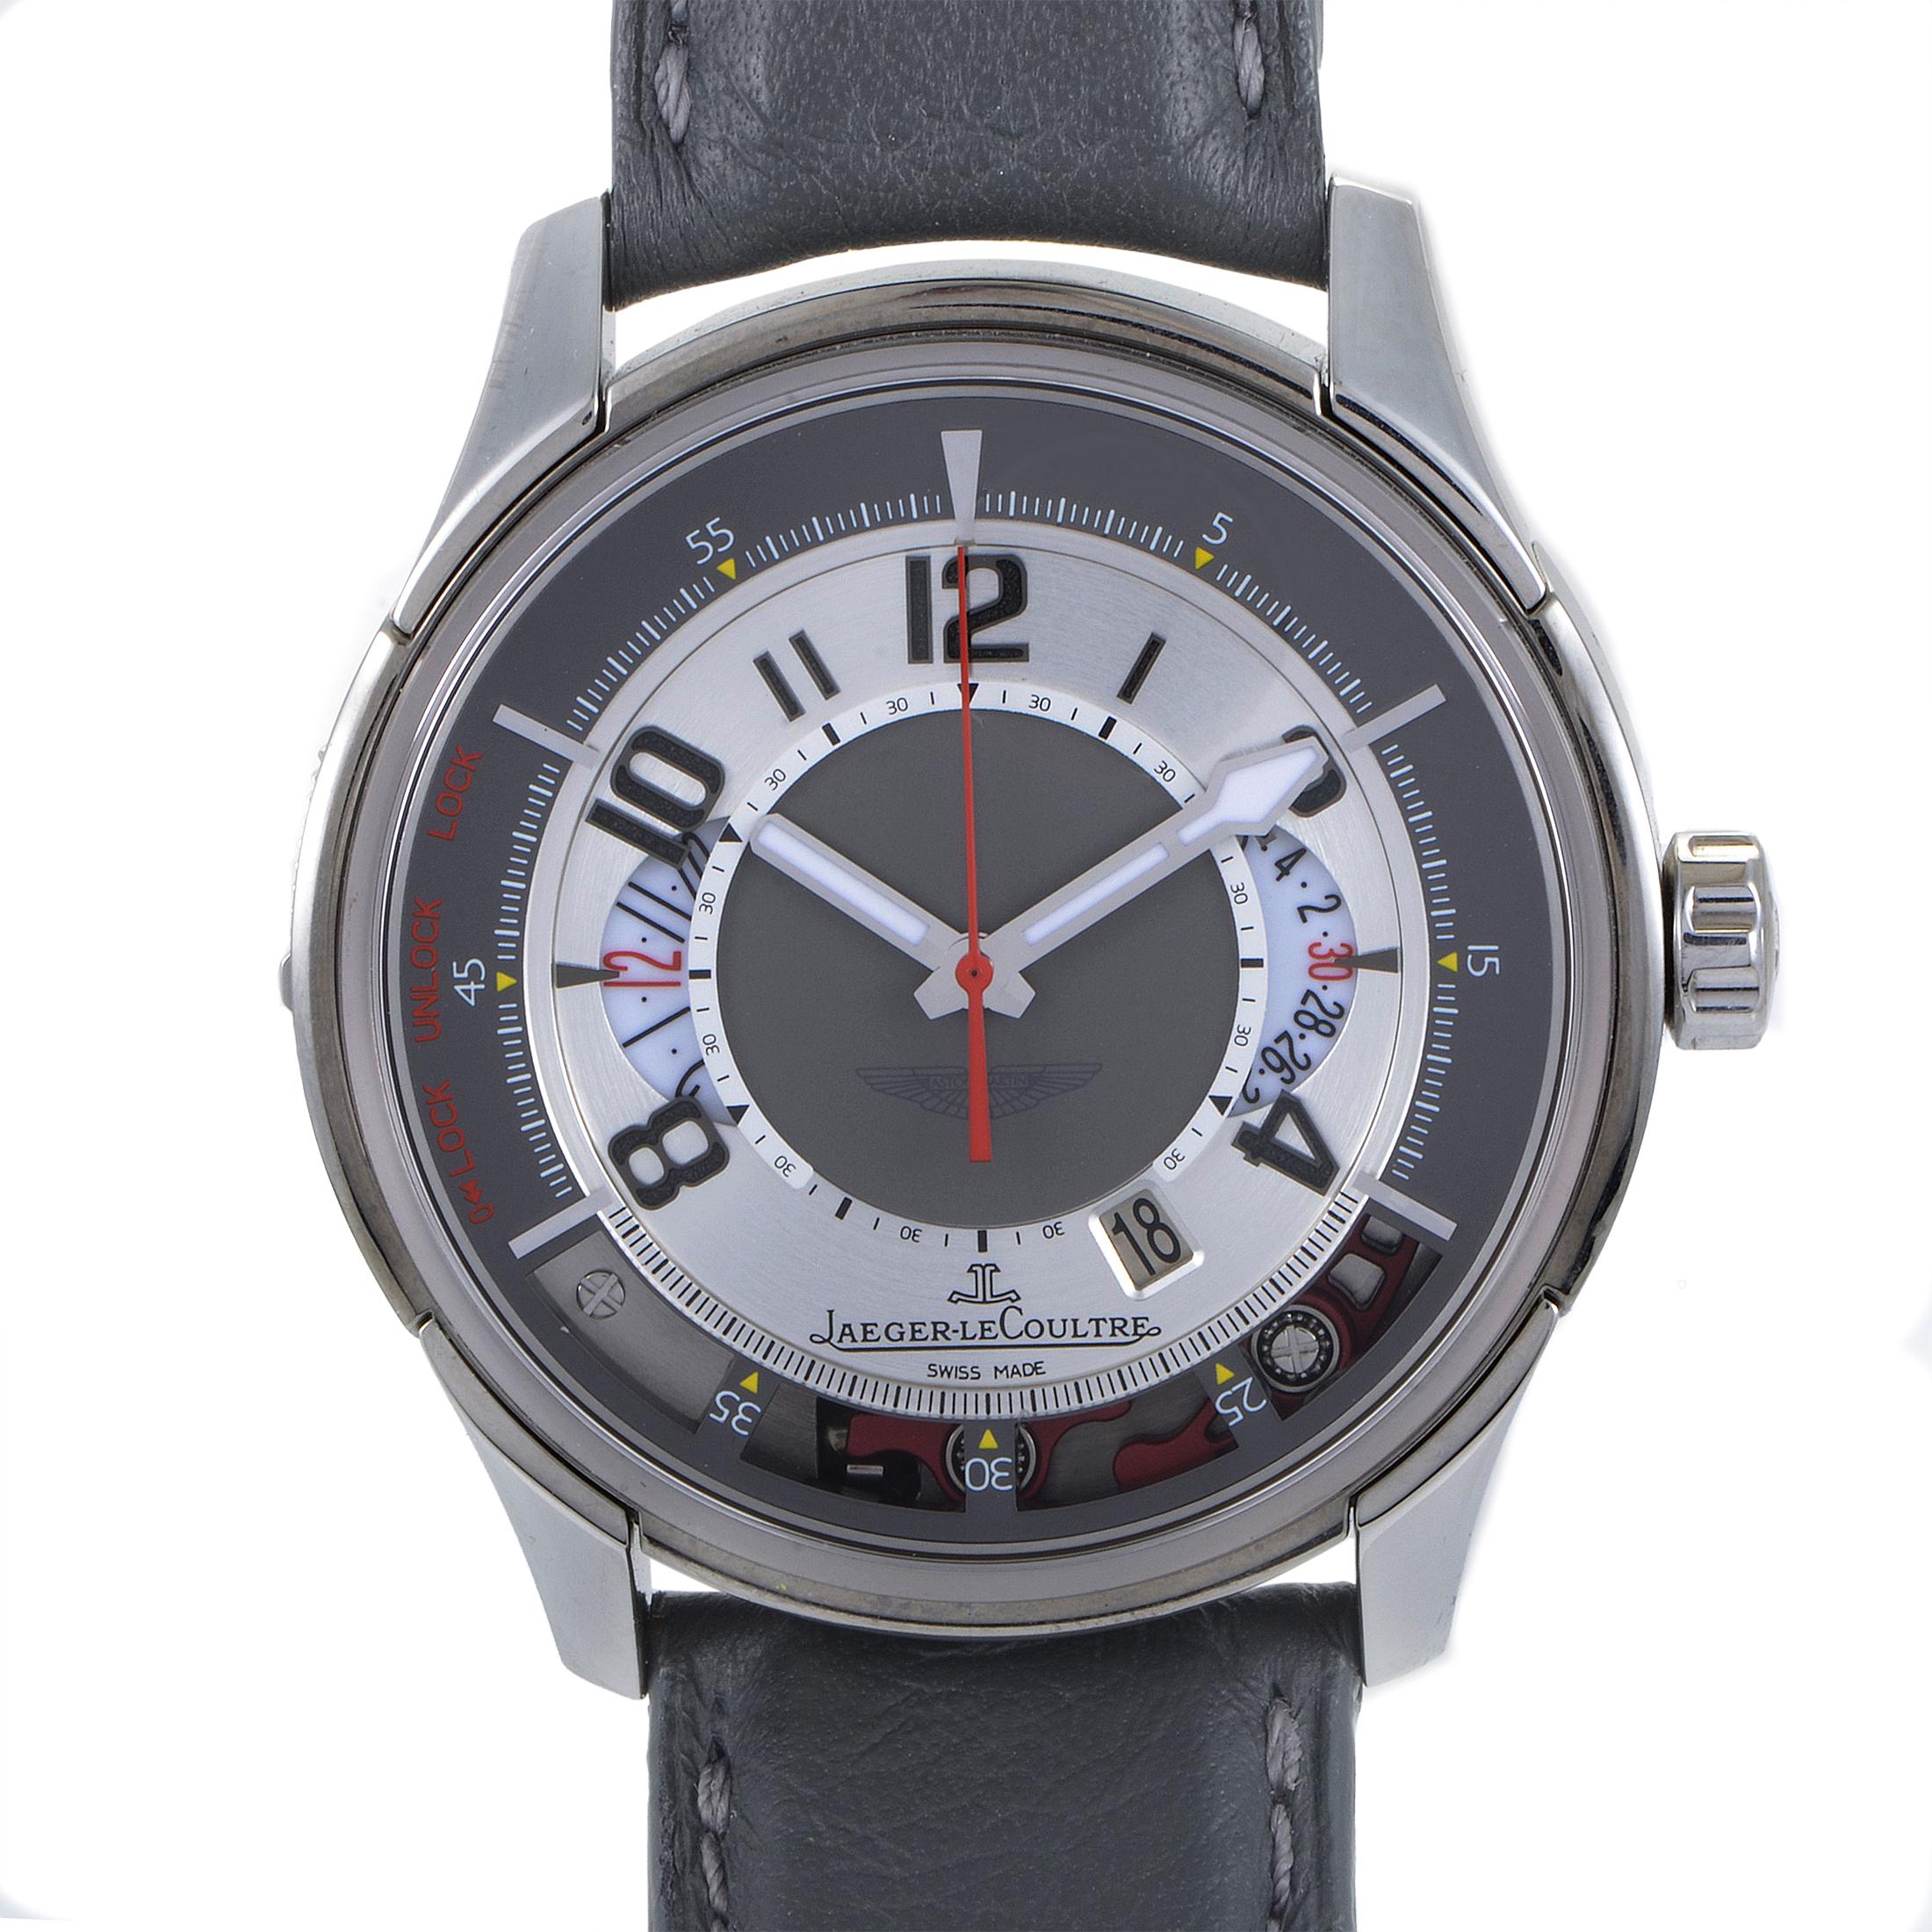 AMVOX2 Chronograph Men's Automatic Watch Q1926440